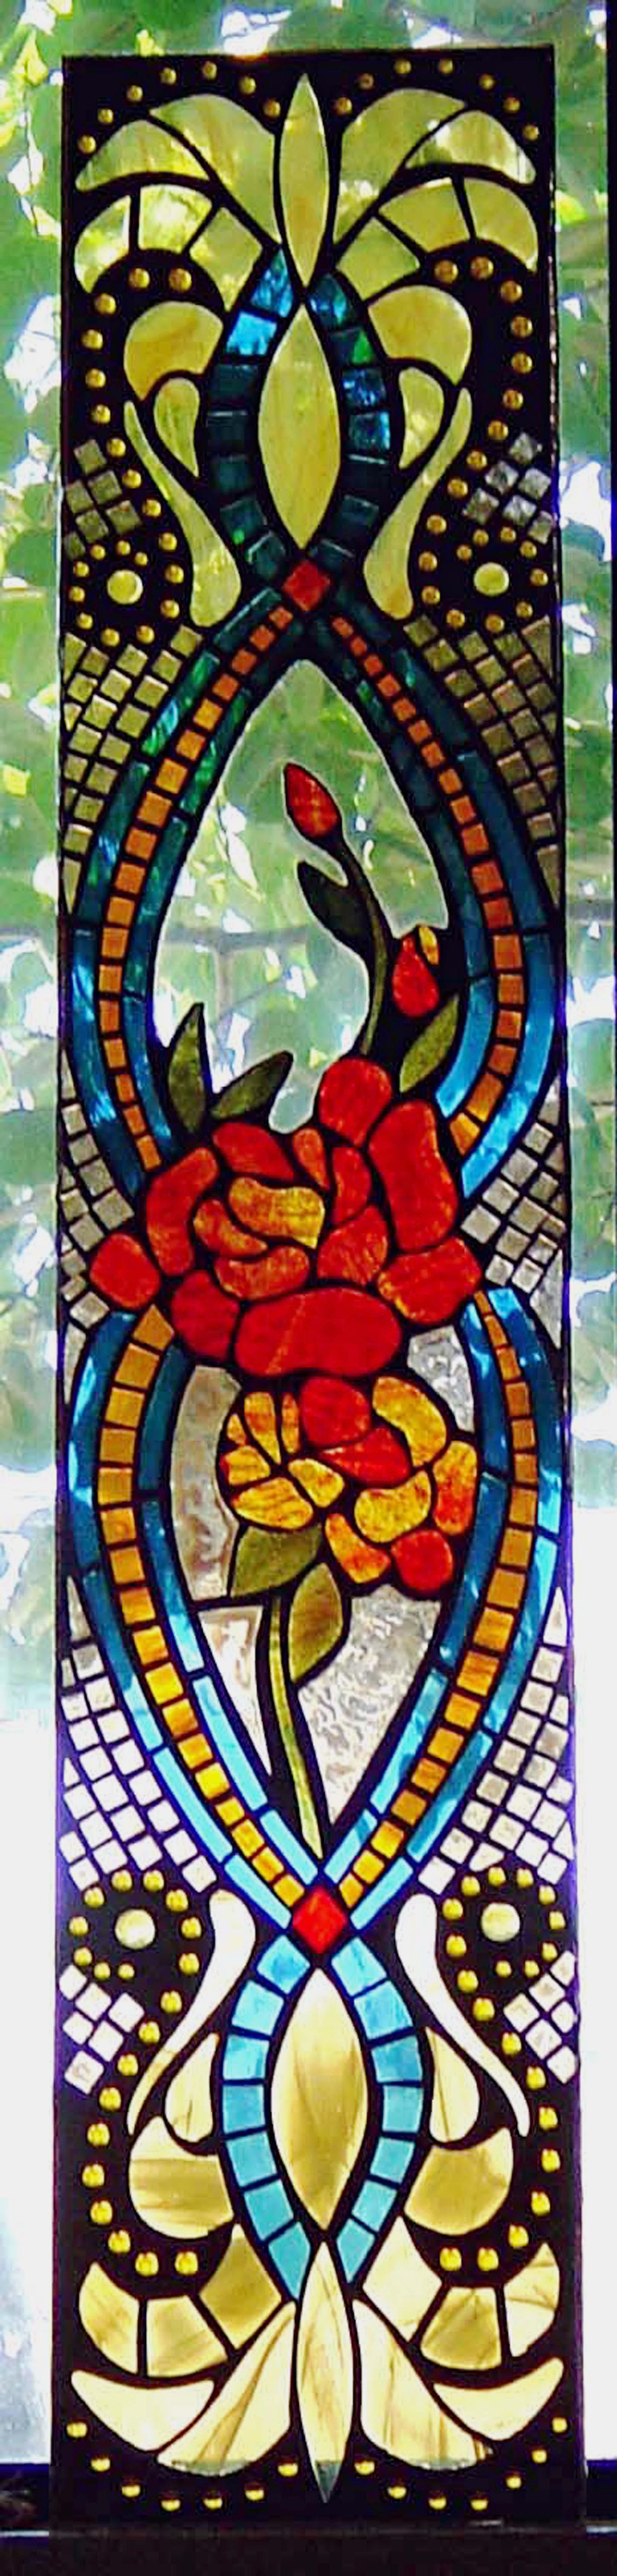 rose window on aspens.jpg